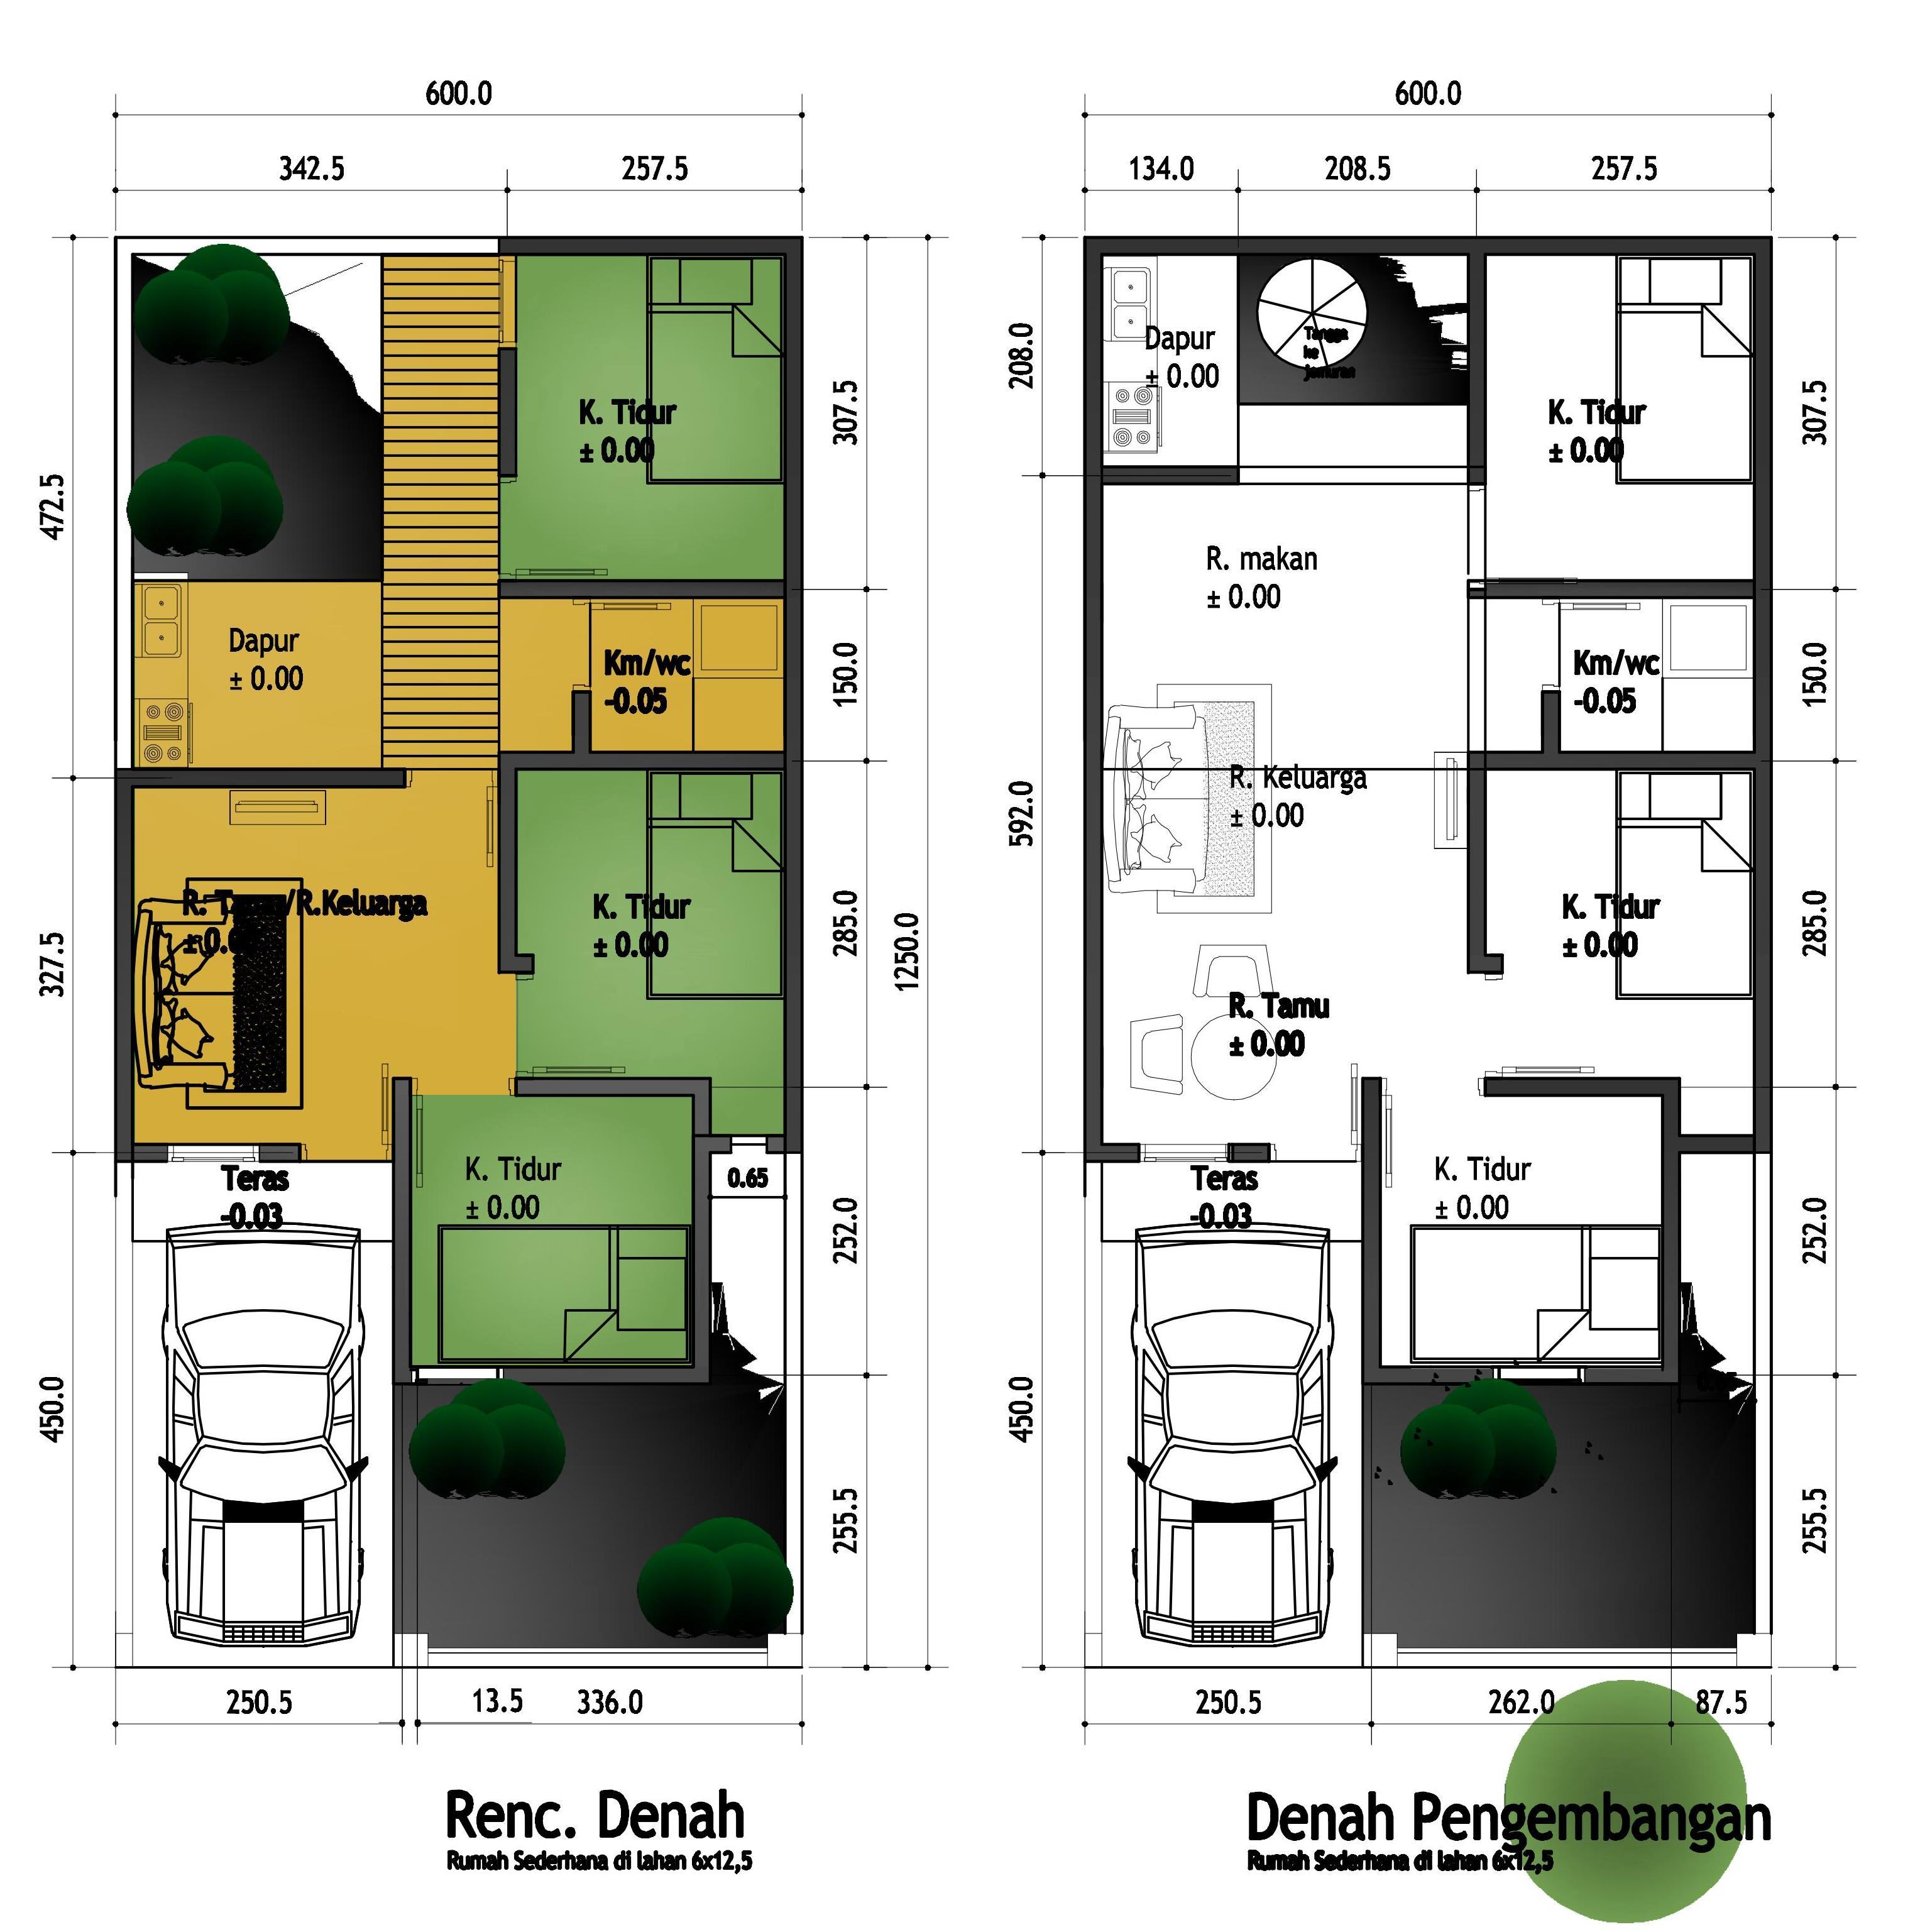 Contoh Denah Rumah Minimalis Sederhana Modern | Cookingareas.Com